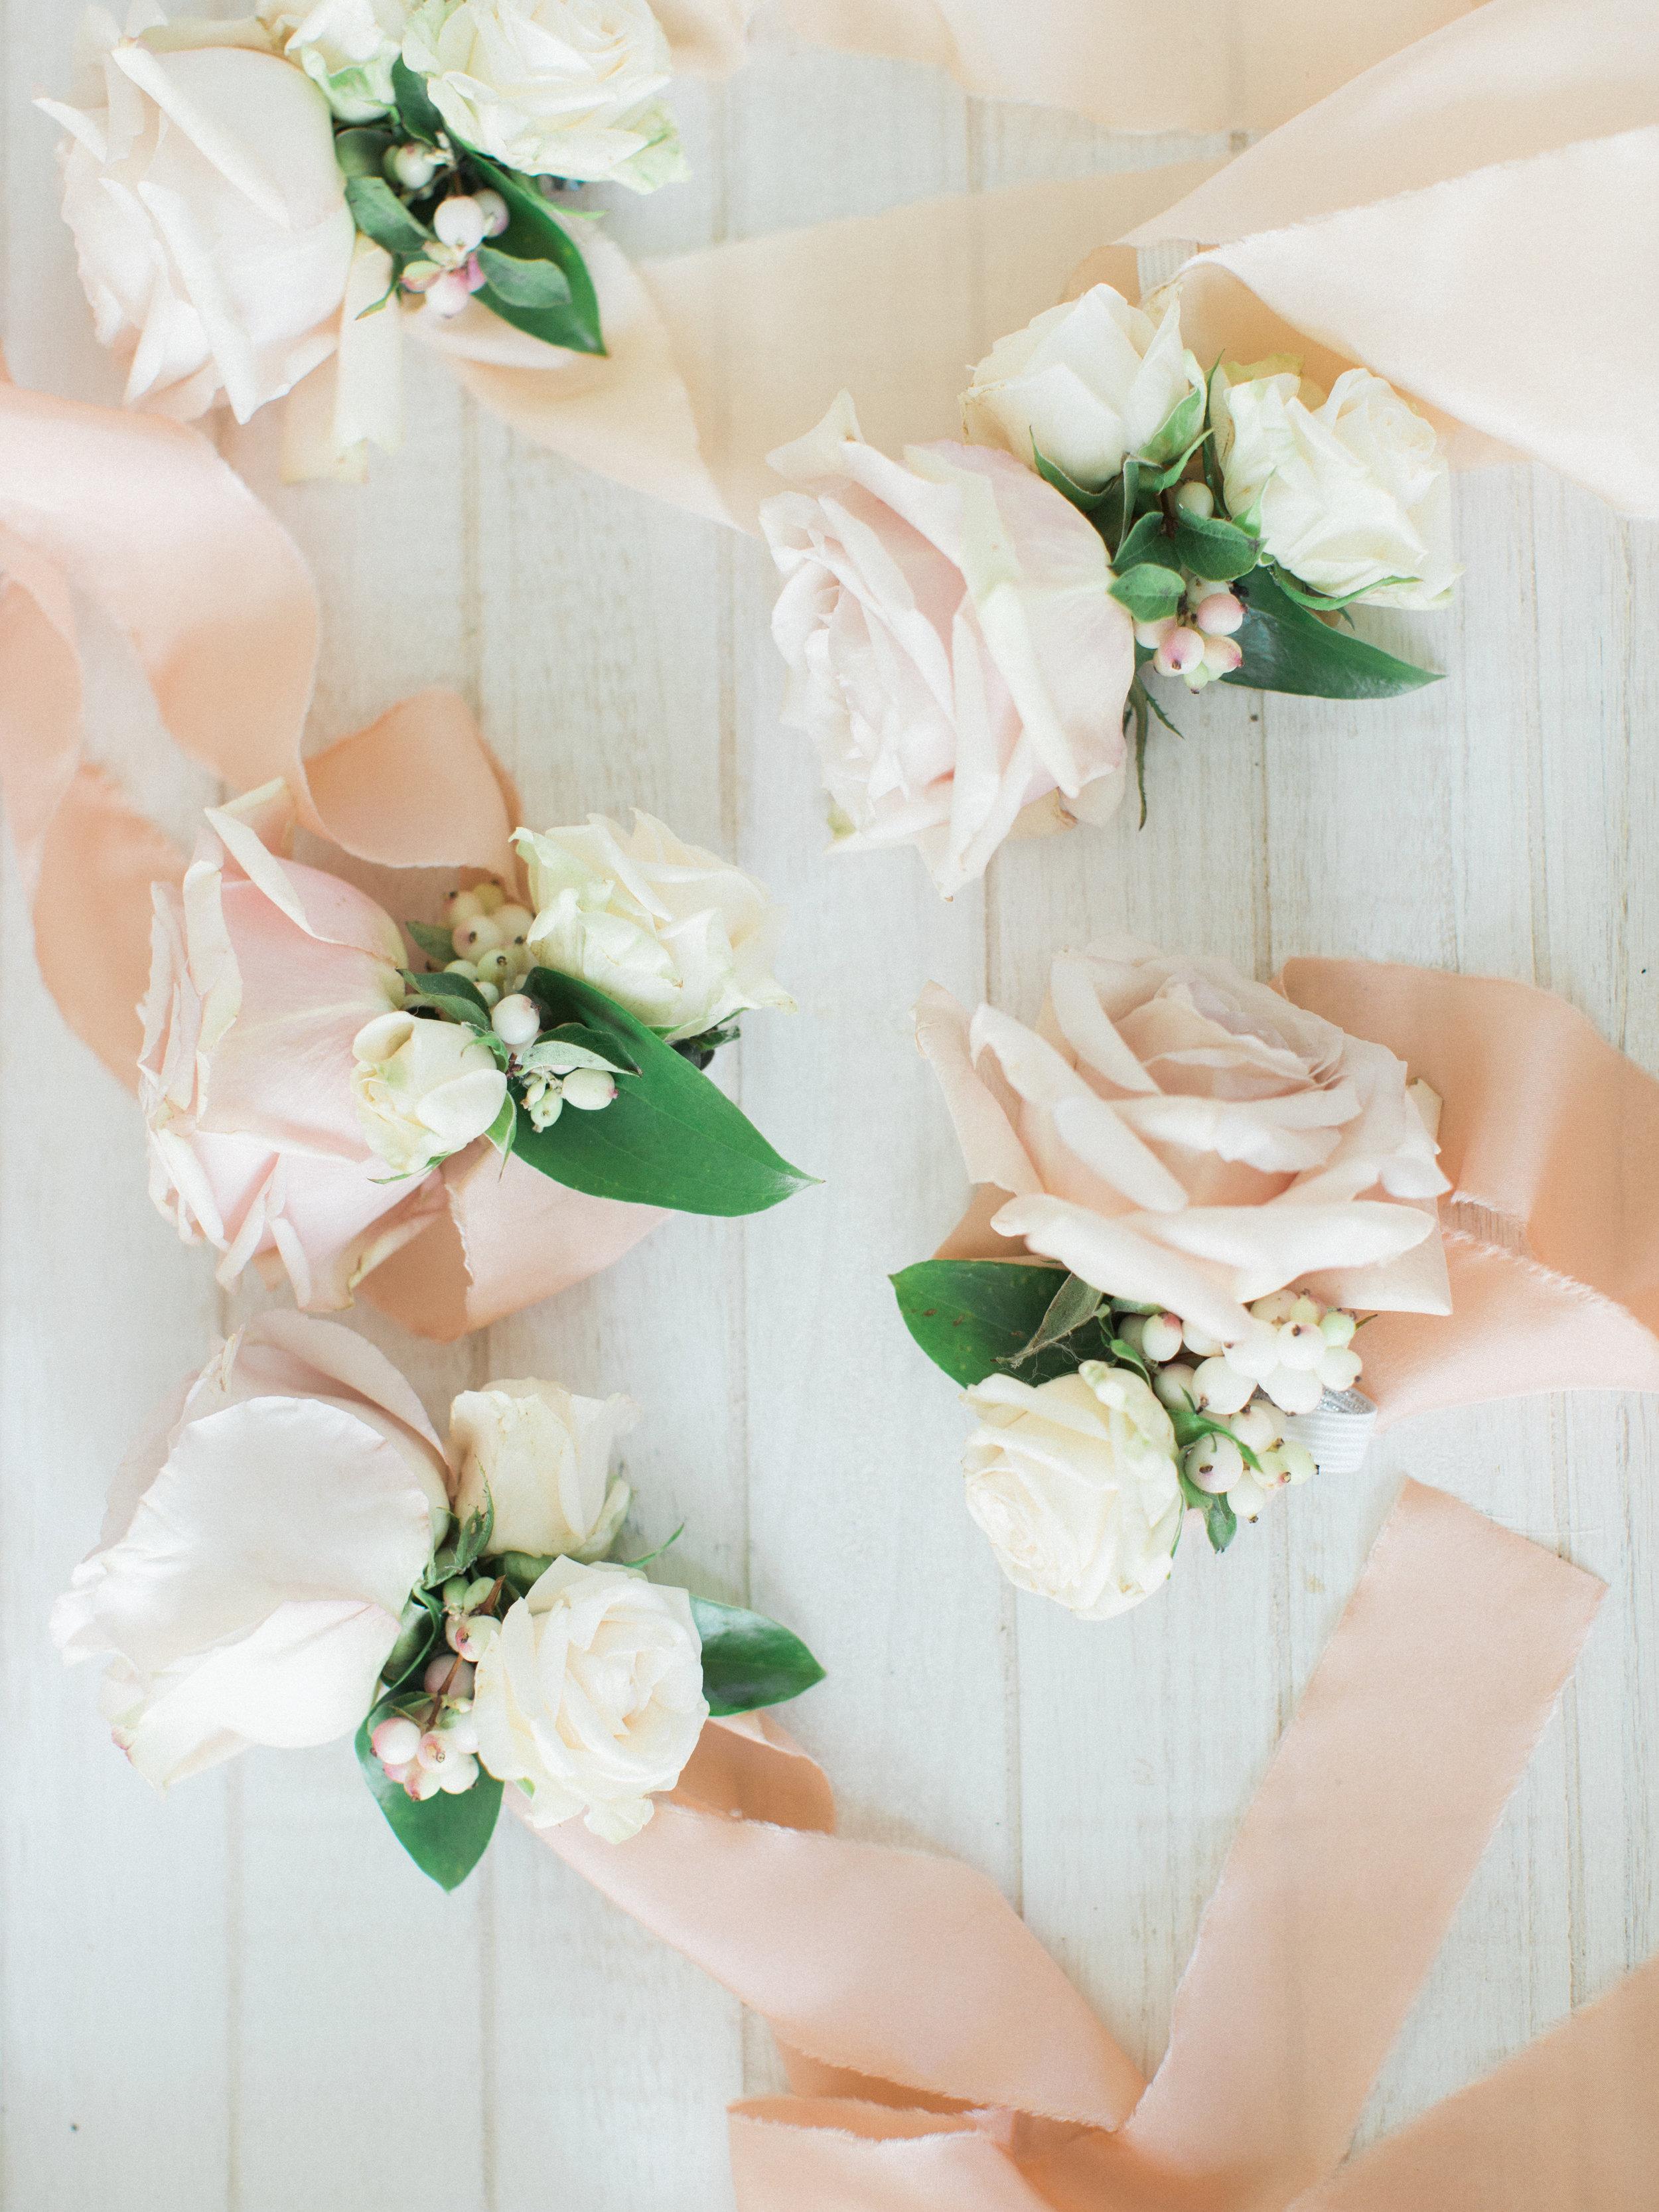 trynhphoto_socal_sf_halfmoon_bay_wedding_photographer_JA-22.jpg